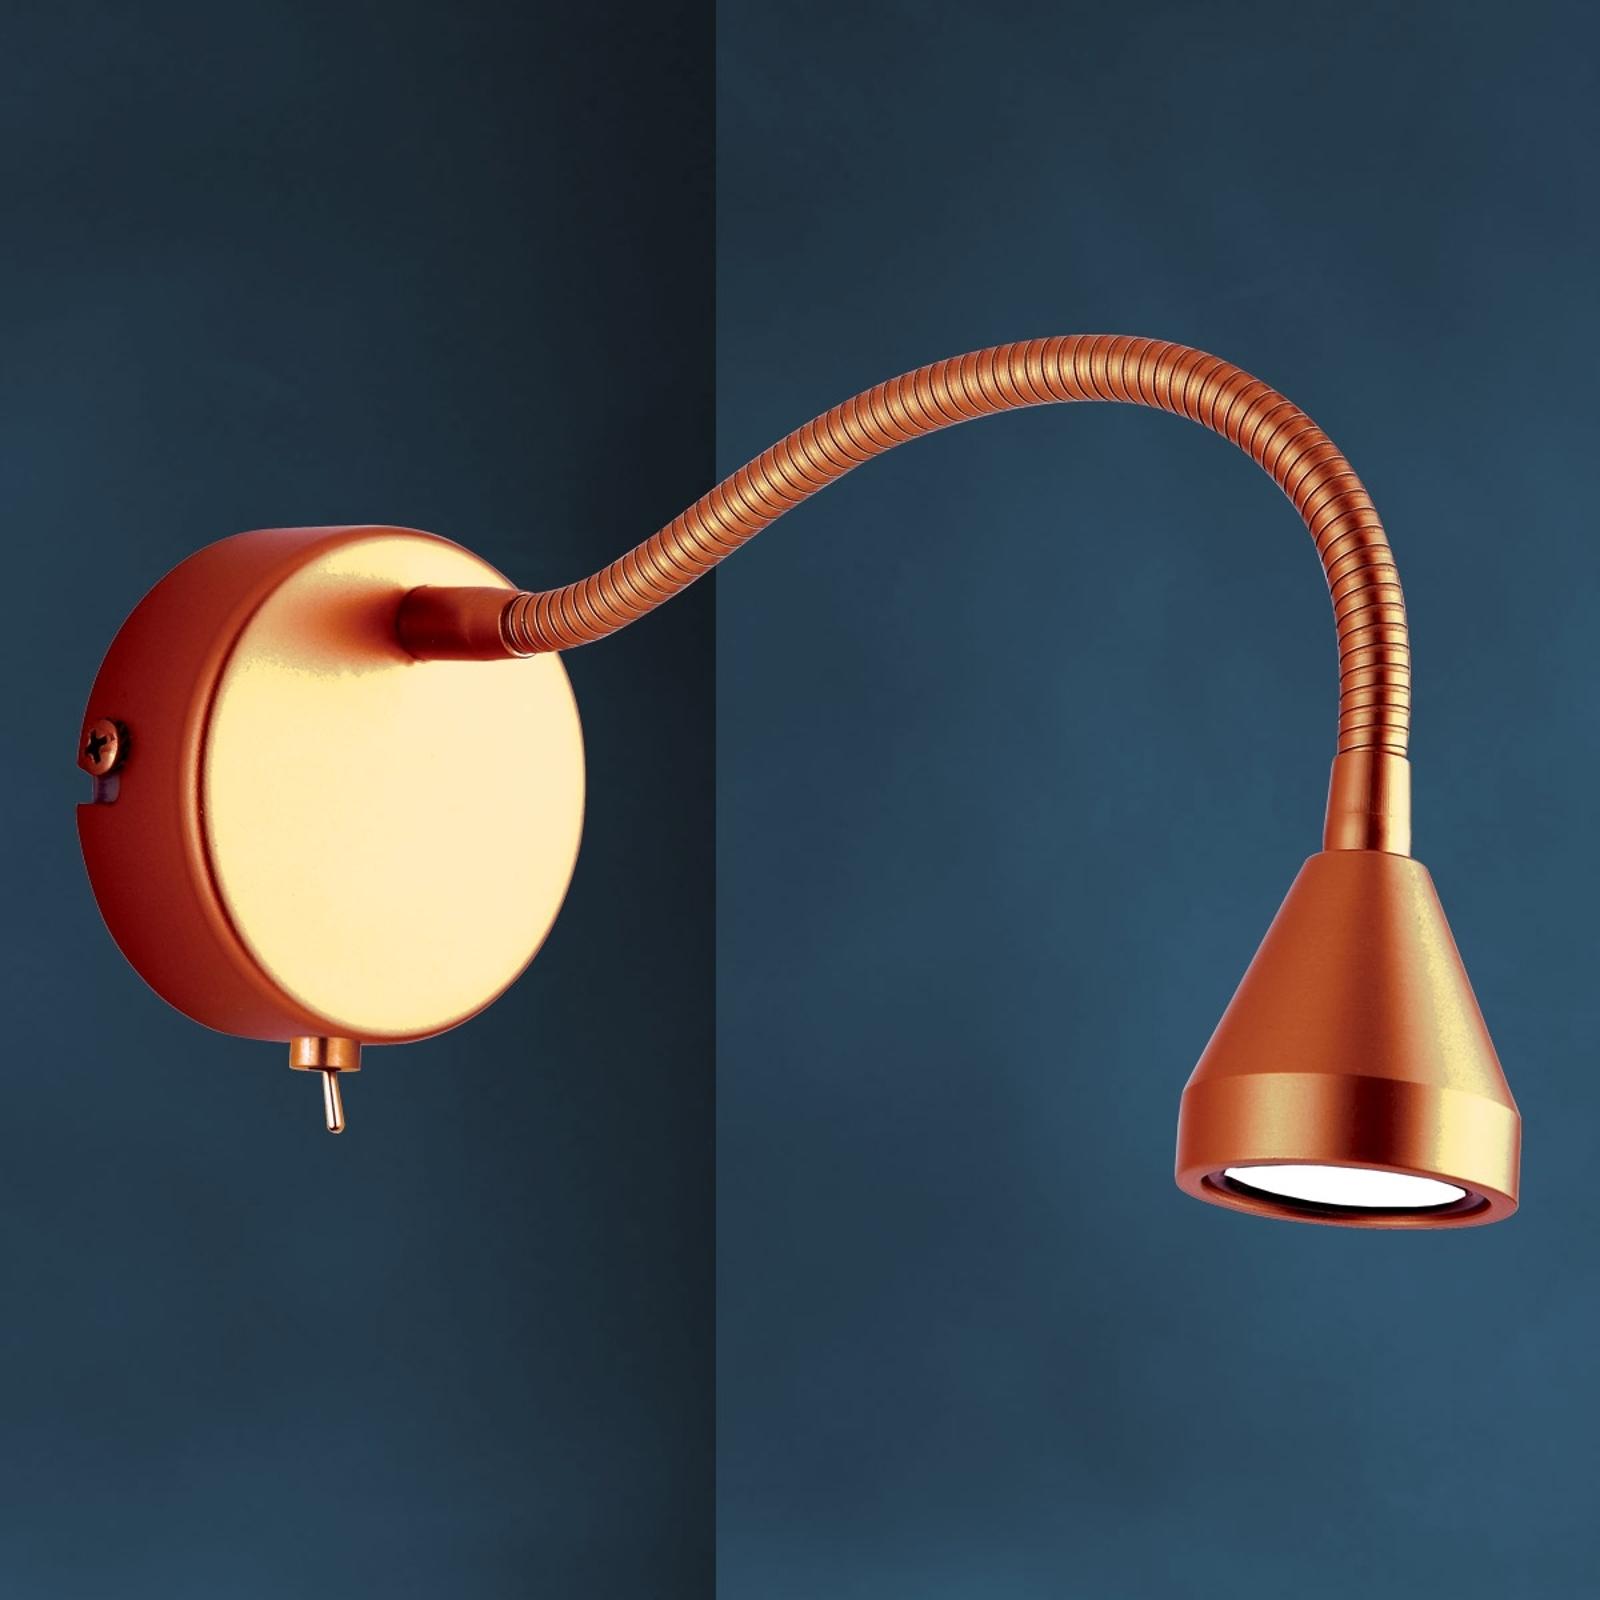 Flexibel LED-vägglampa MINI i antik design